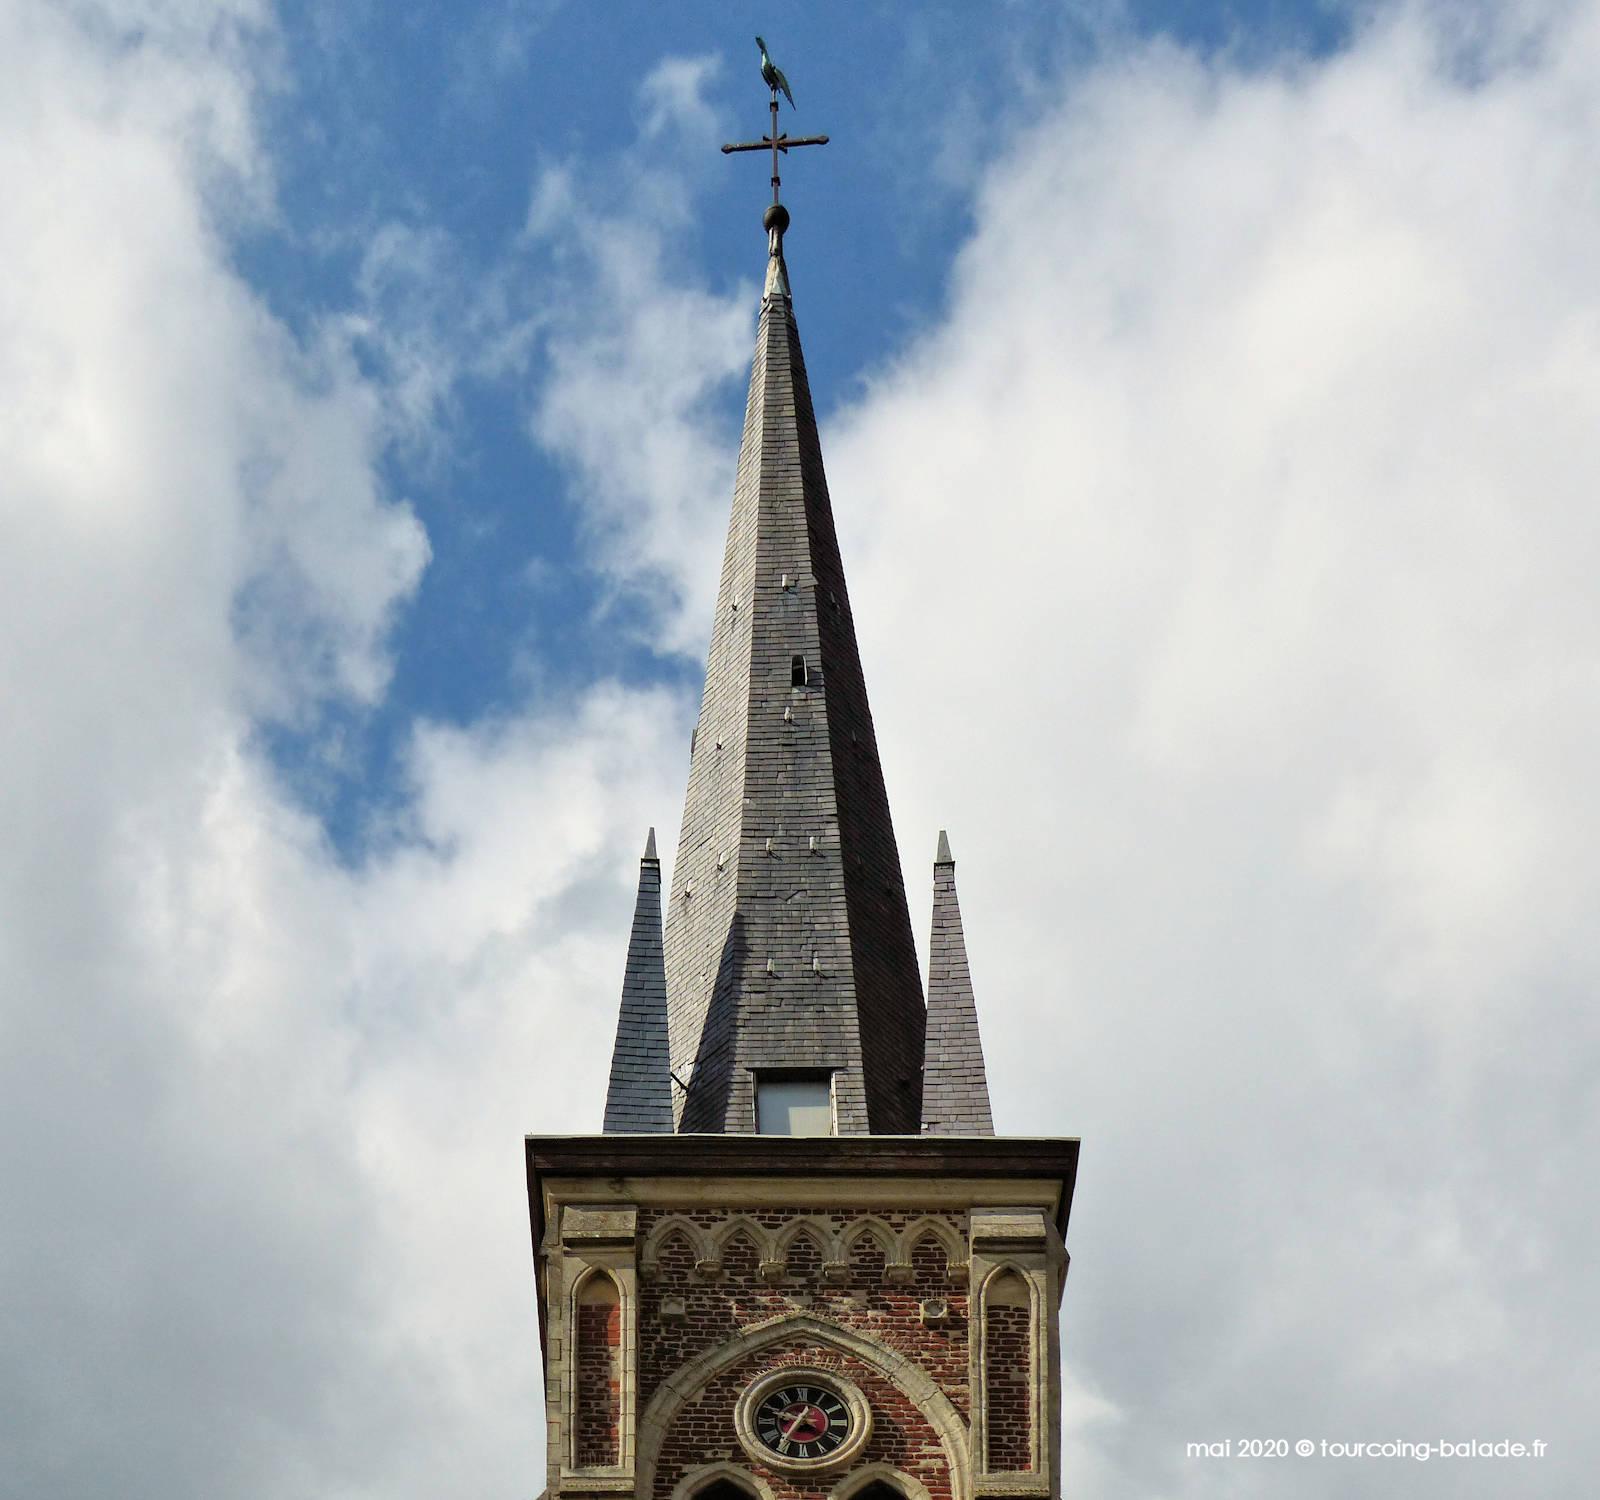 Flèche de l'Église Sainte Rita, Vendeville, 2020.